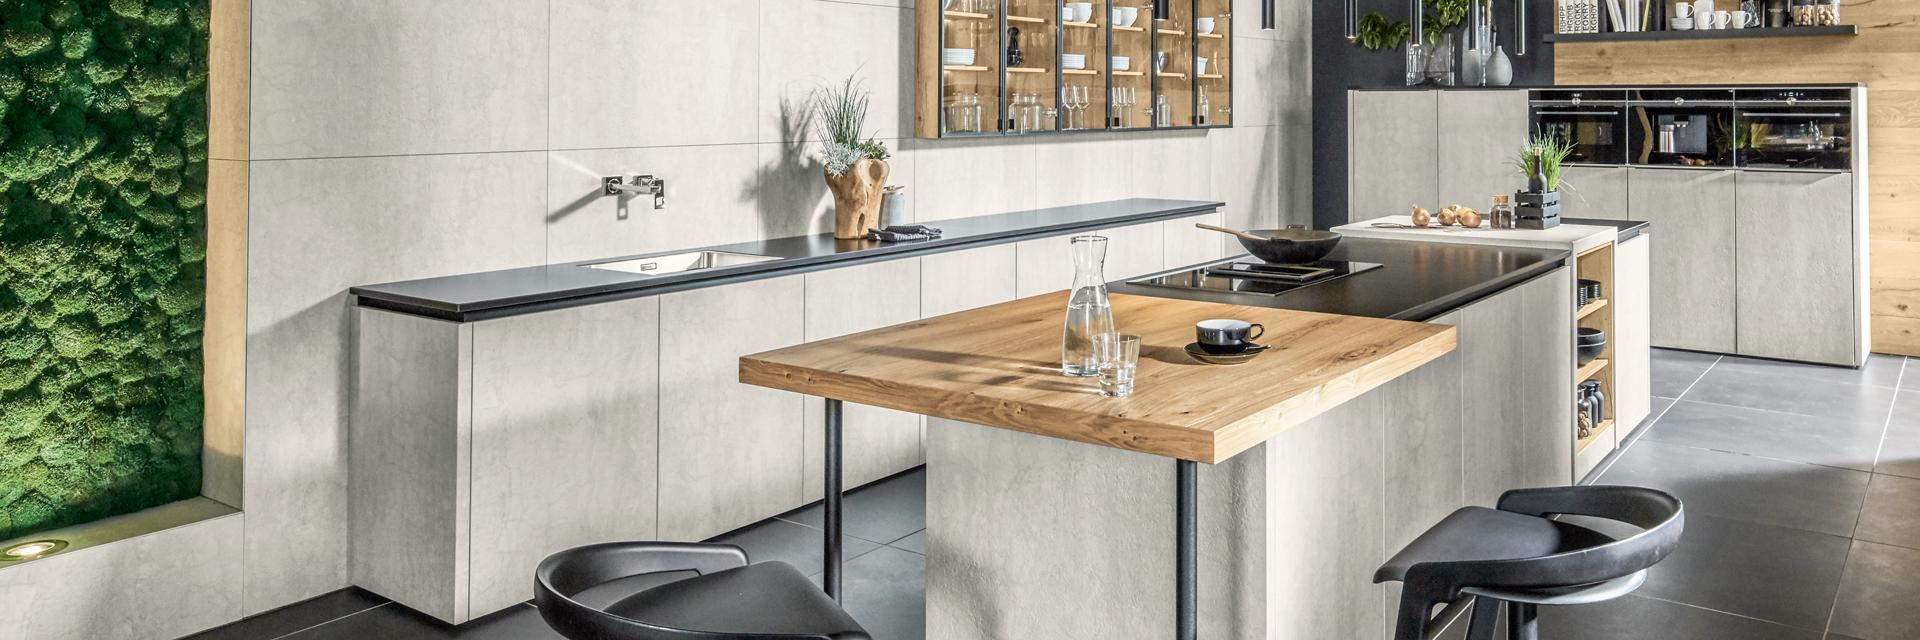 Ecook Pro keukens | Eigenhuis Keukens